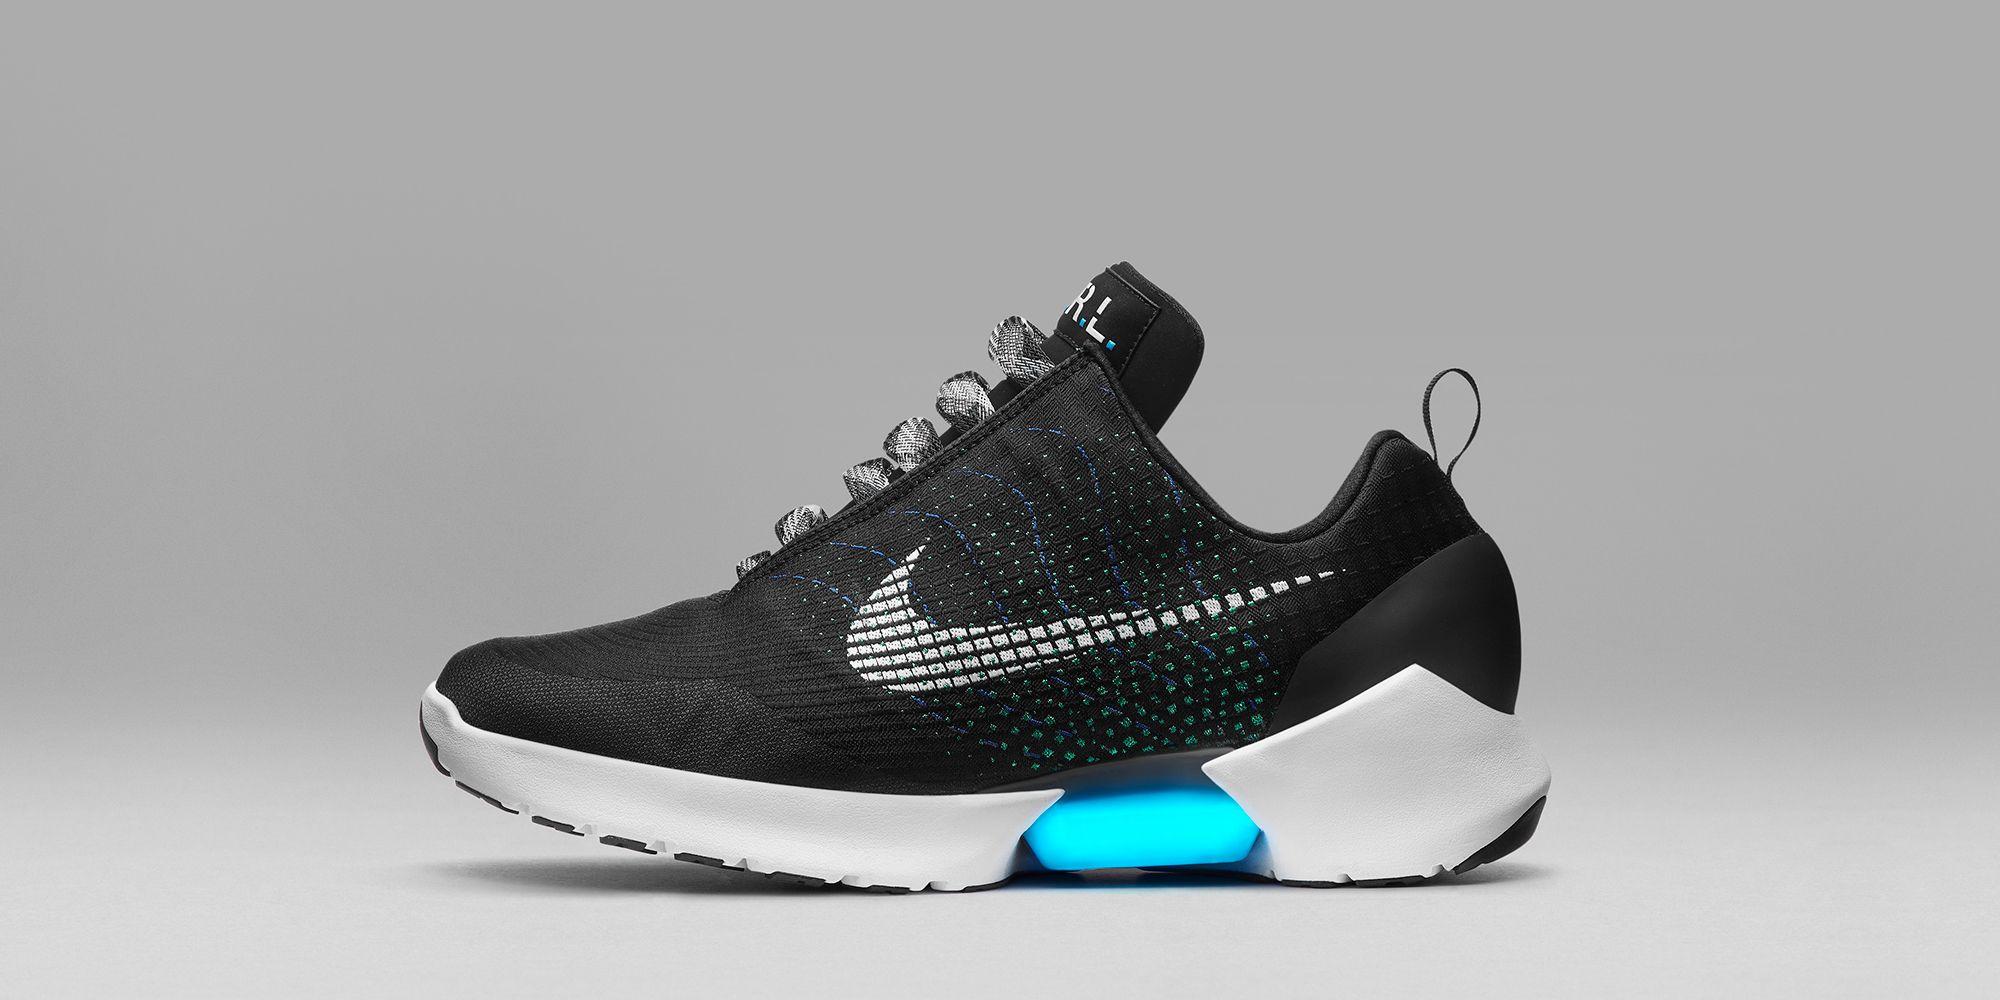 New Nike HyperAdapt 1.0 Review - Nike's